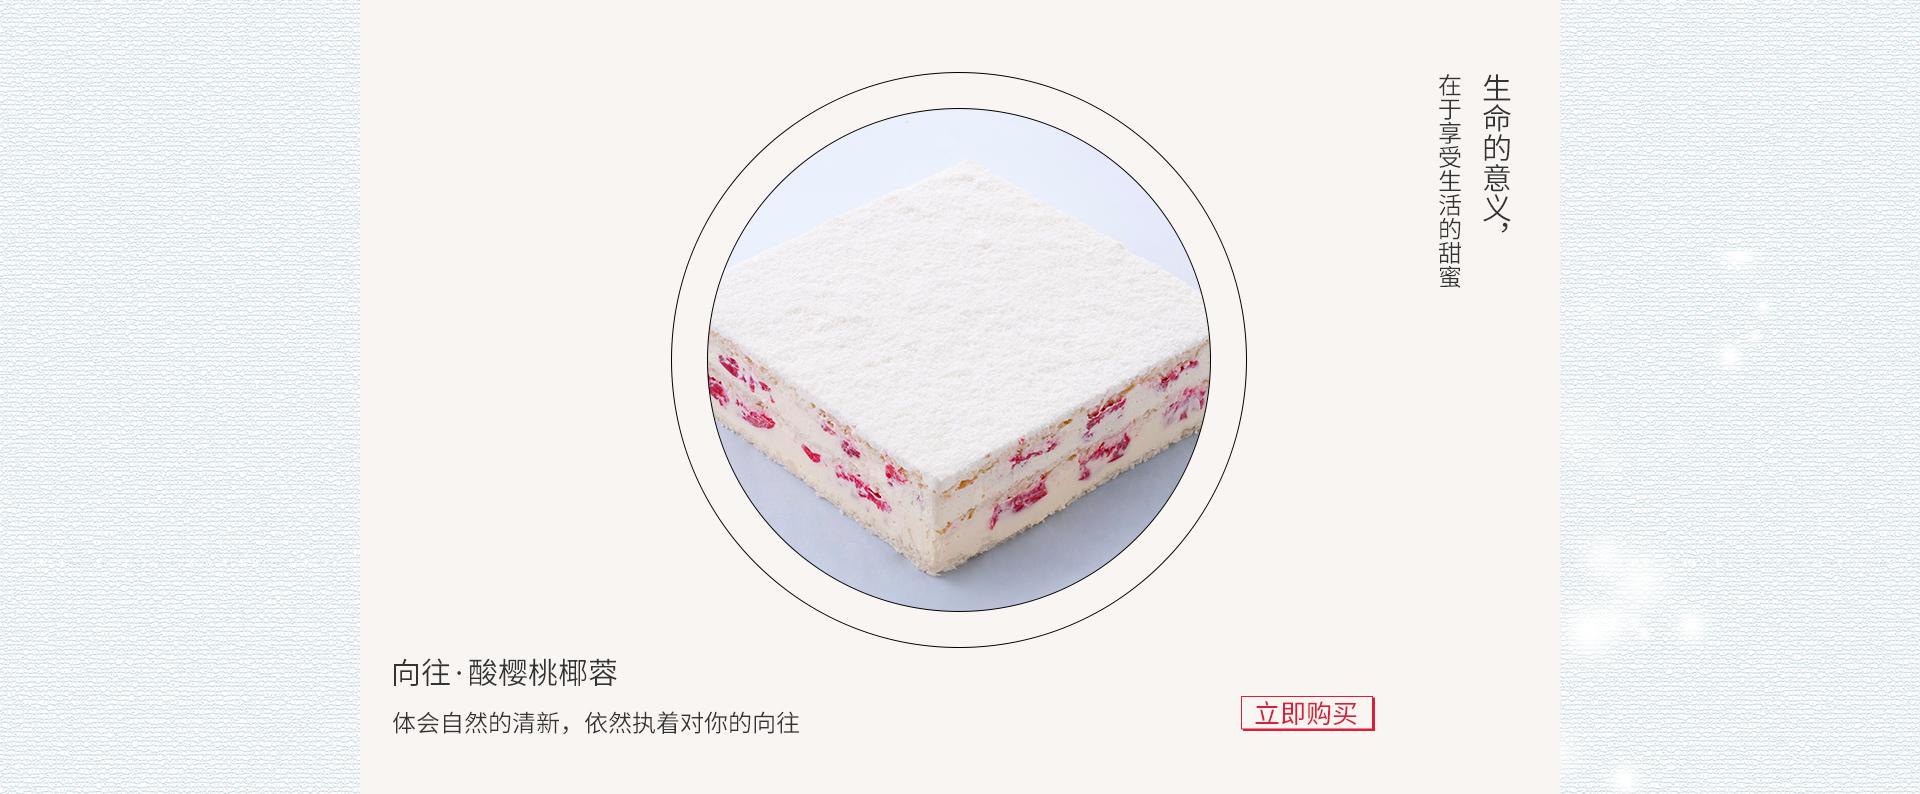 ebeecake小蜜蜂蛋糕 向往|酸樱桃椰蓉蛋糕